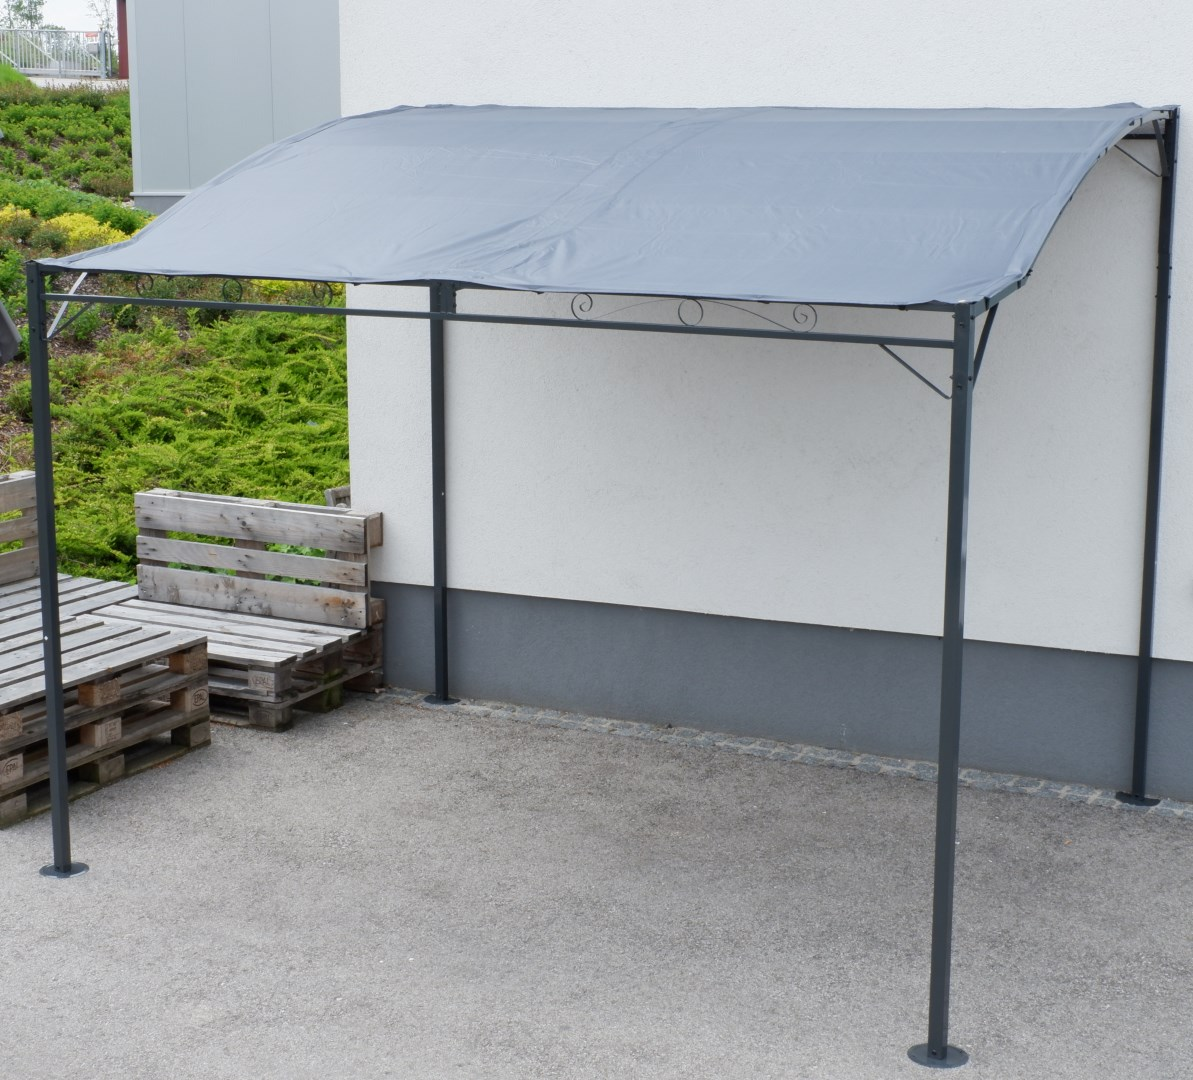 wand anbau pavillon 3 x 2 5 meter mit dach 100 wasserdicht uv30 model topea anthrazit